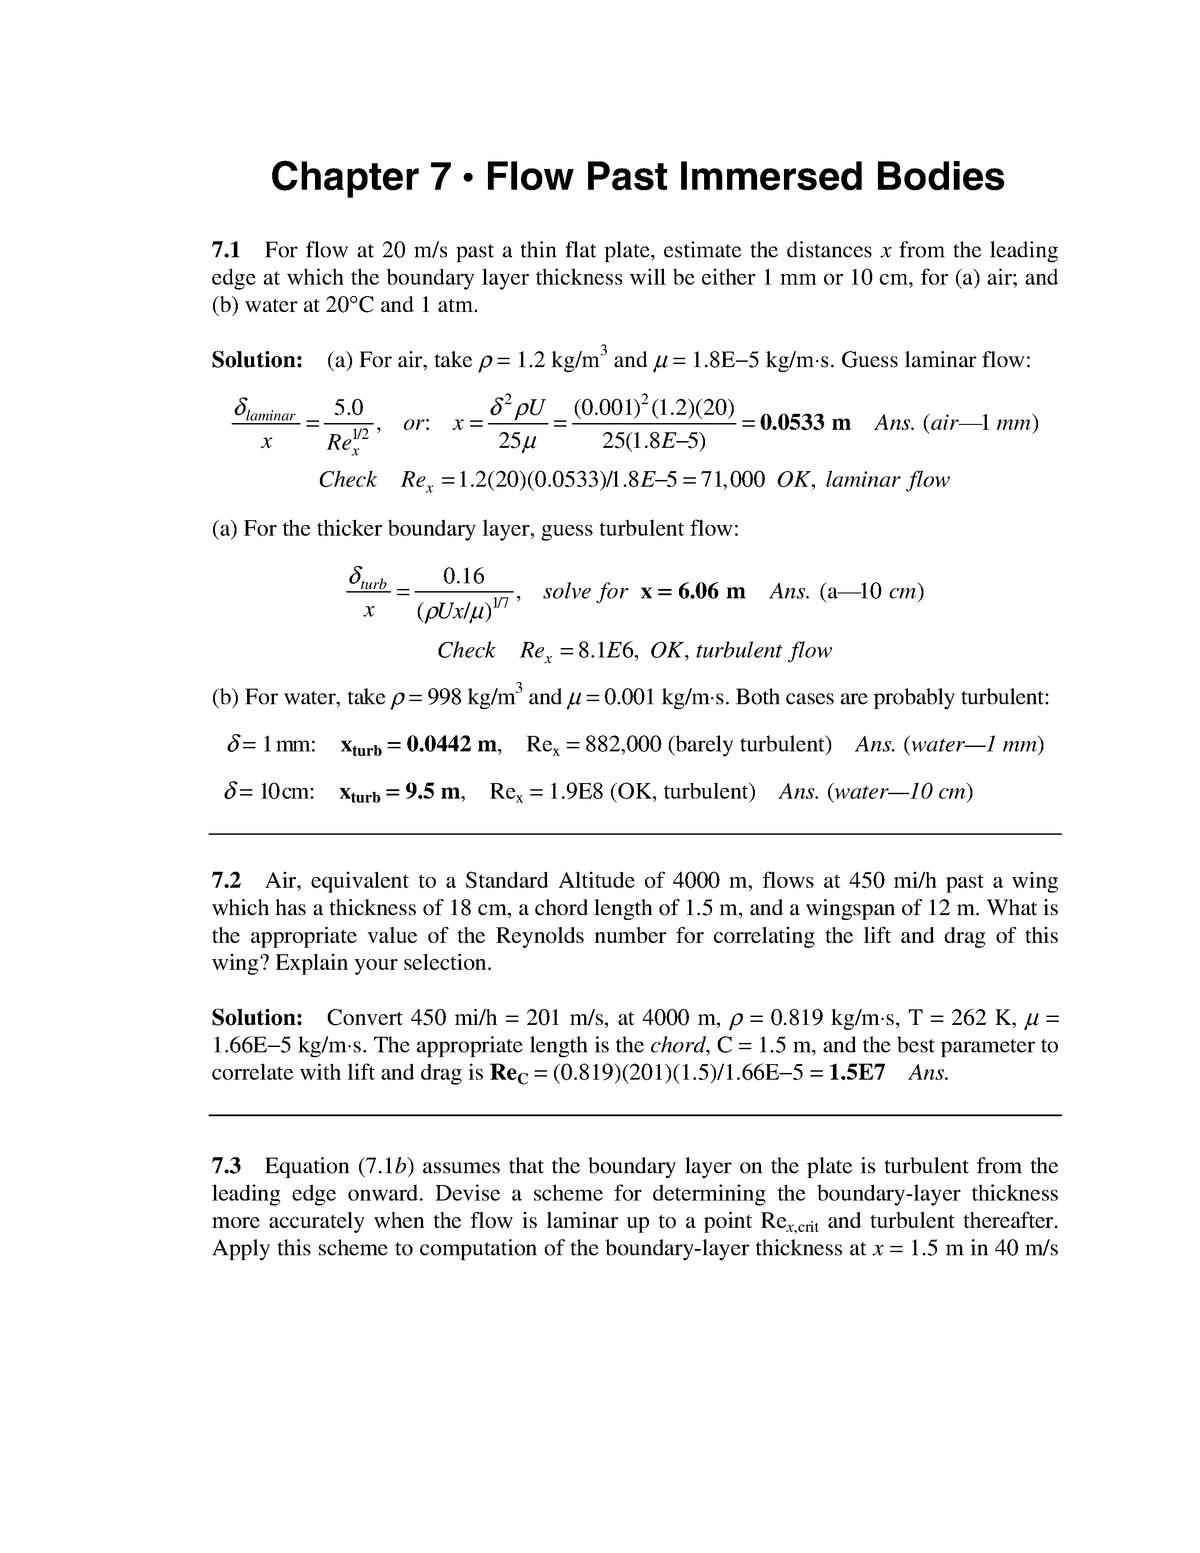 Solution Manual Fluid Mechanics White 5th CH 7 - StuDocu